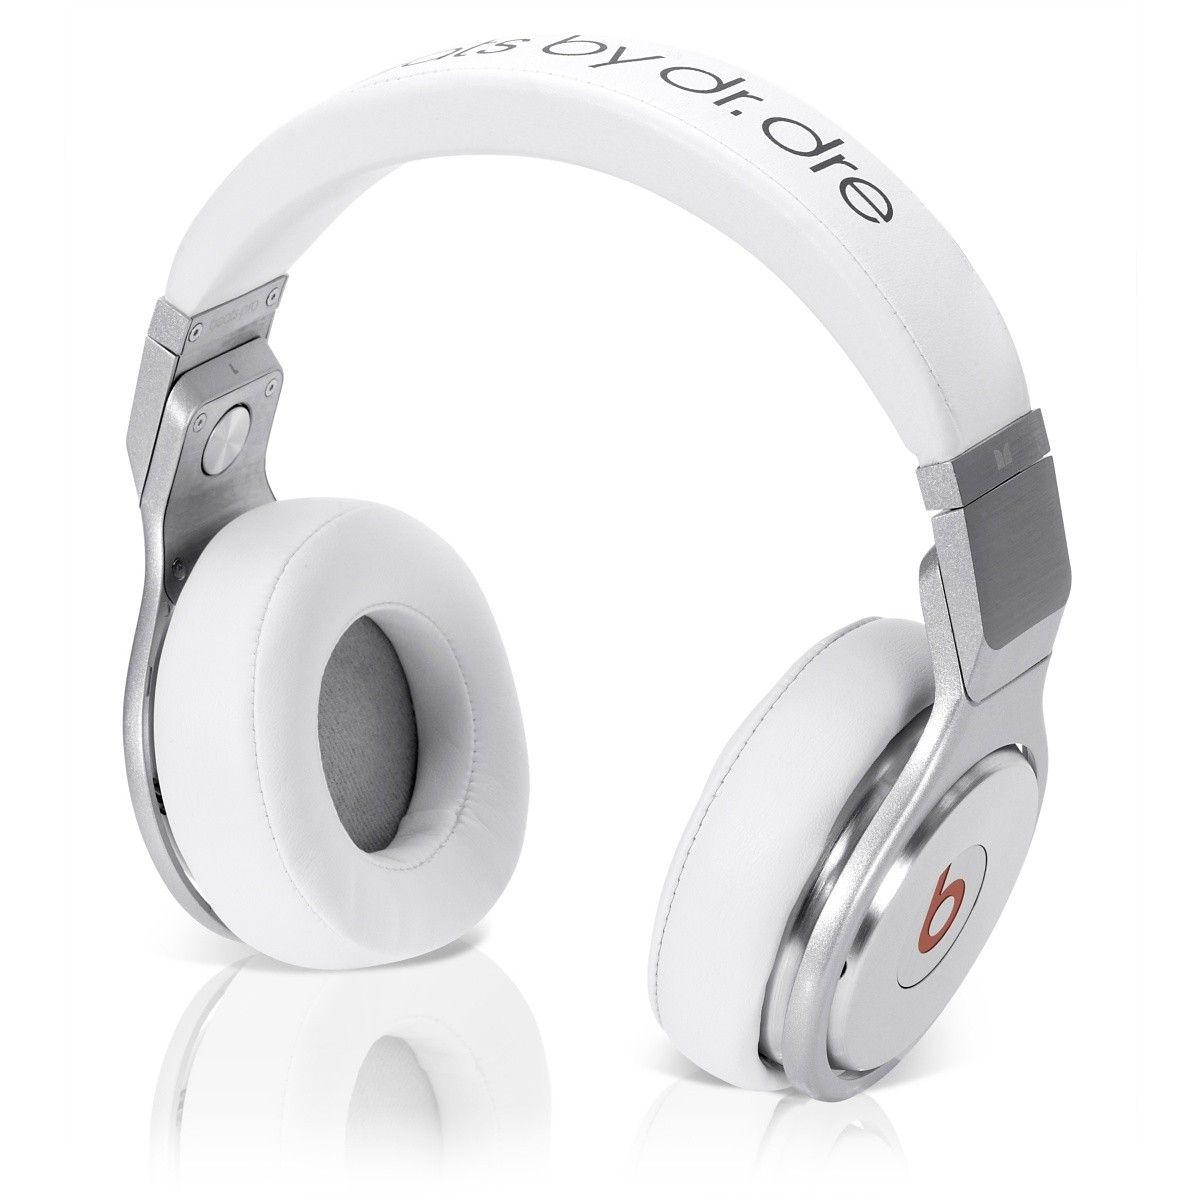 Beats Electronics Llc V The Partnerships And Unincorporated Associations Identified On Schedule A Case No 13 Beats Pro Headphones Beats Headphones Black